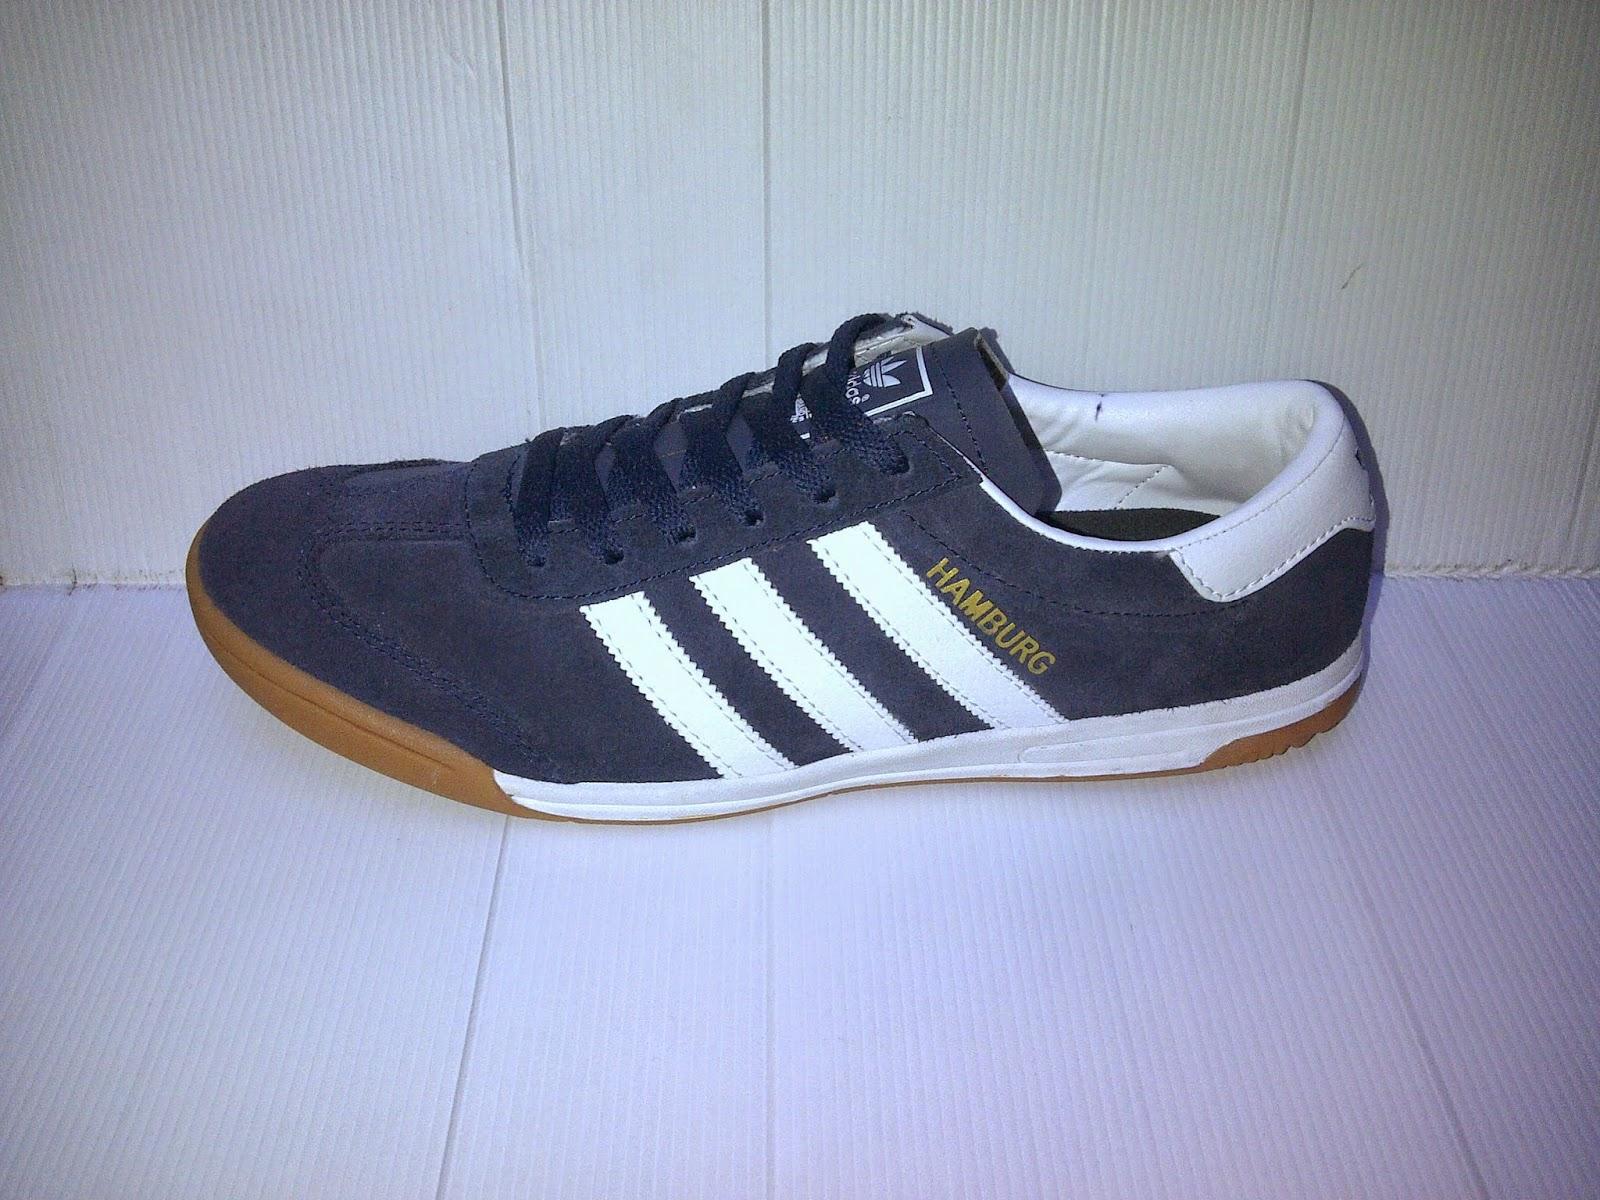 8756d9f3c6662e Sepatu Adidas Hamburg - Grosir Sepatu Casual